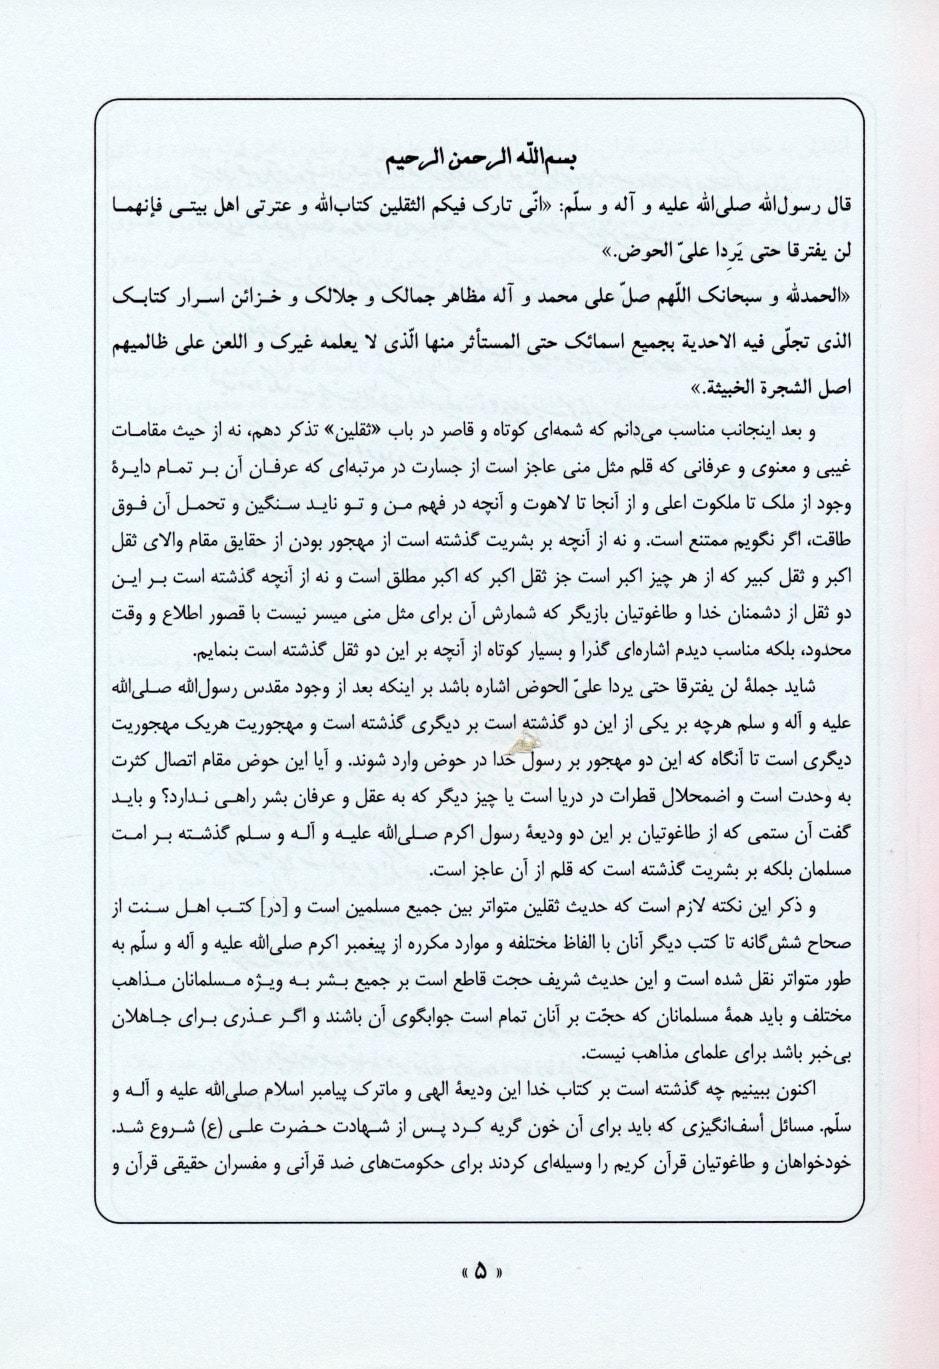 متن کامل صحیفه انقلاب (وصیت نامه سیاسی الهی امام خمینی)